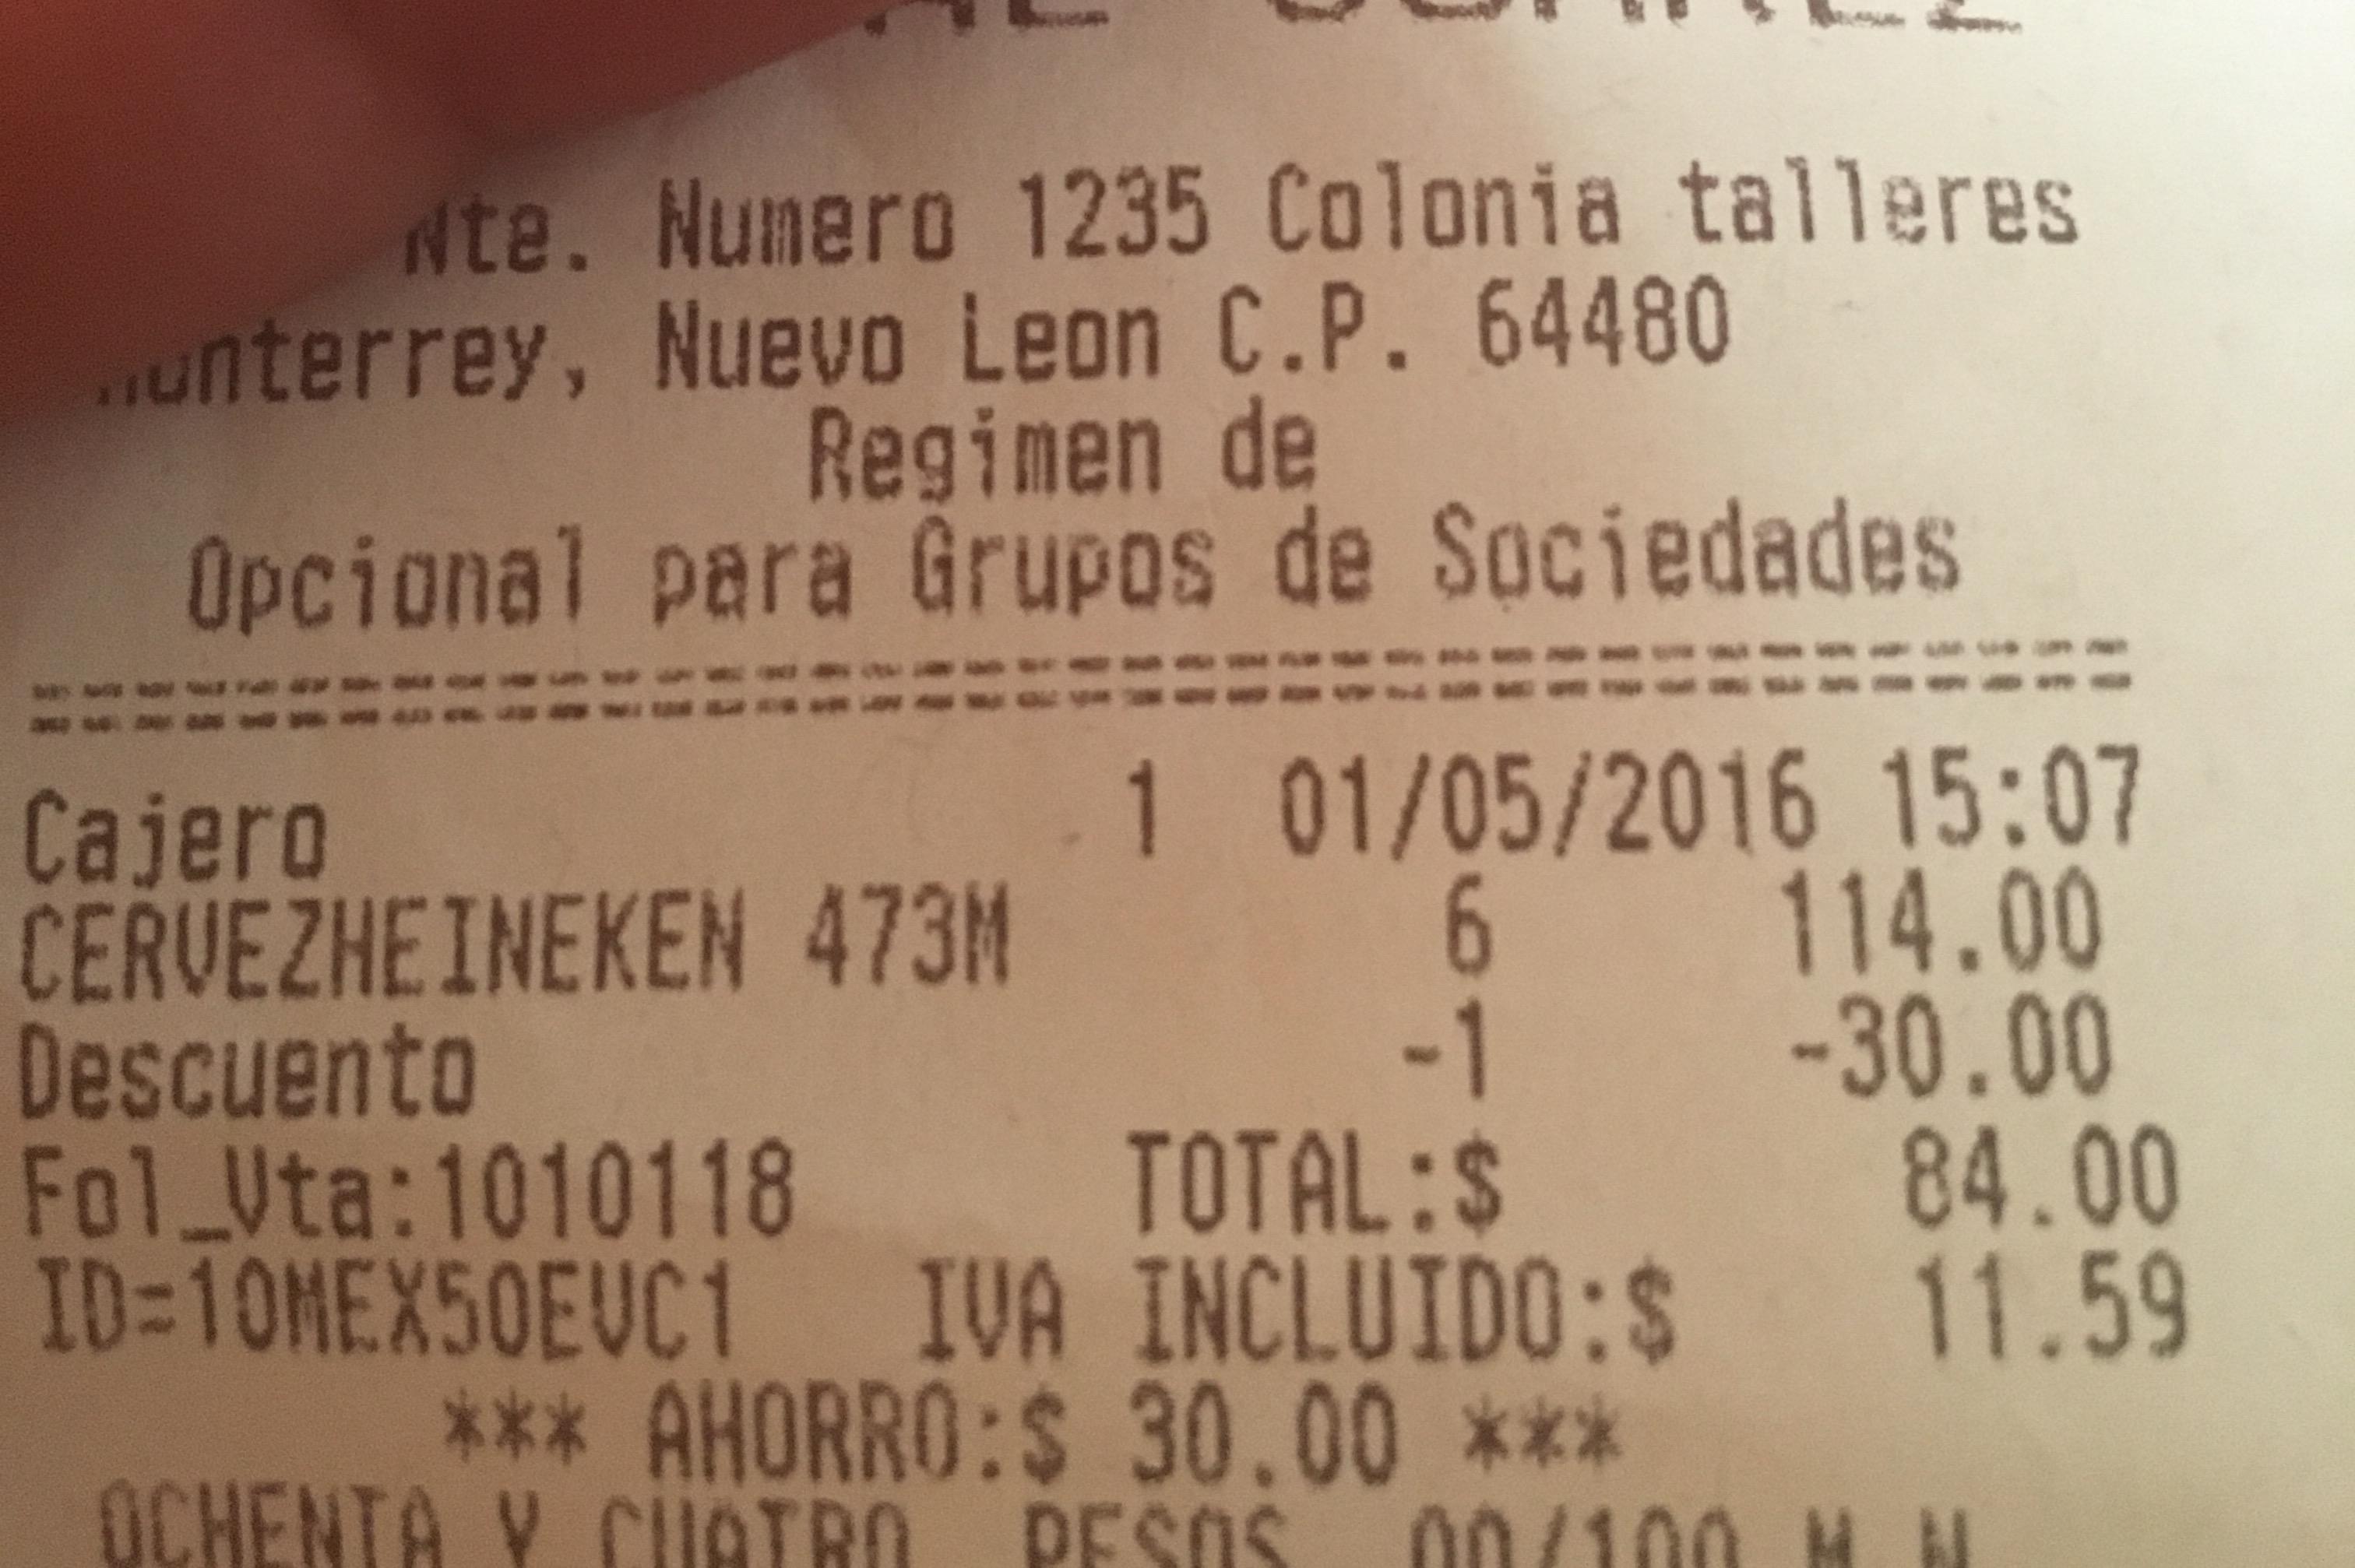 Oxxo: Cerveza Heineken Six de 473 ml a $84